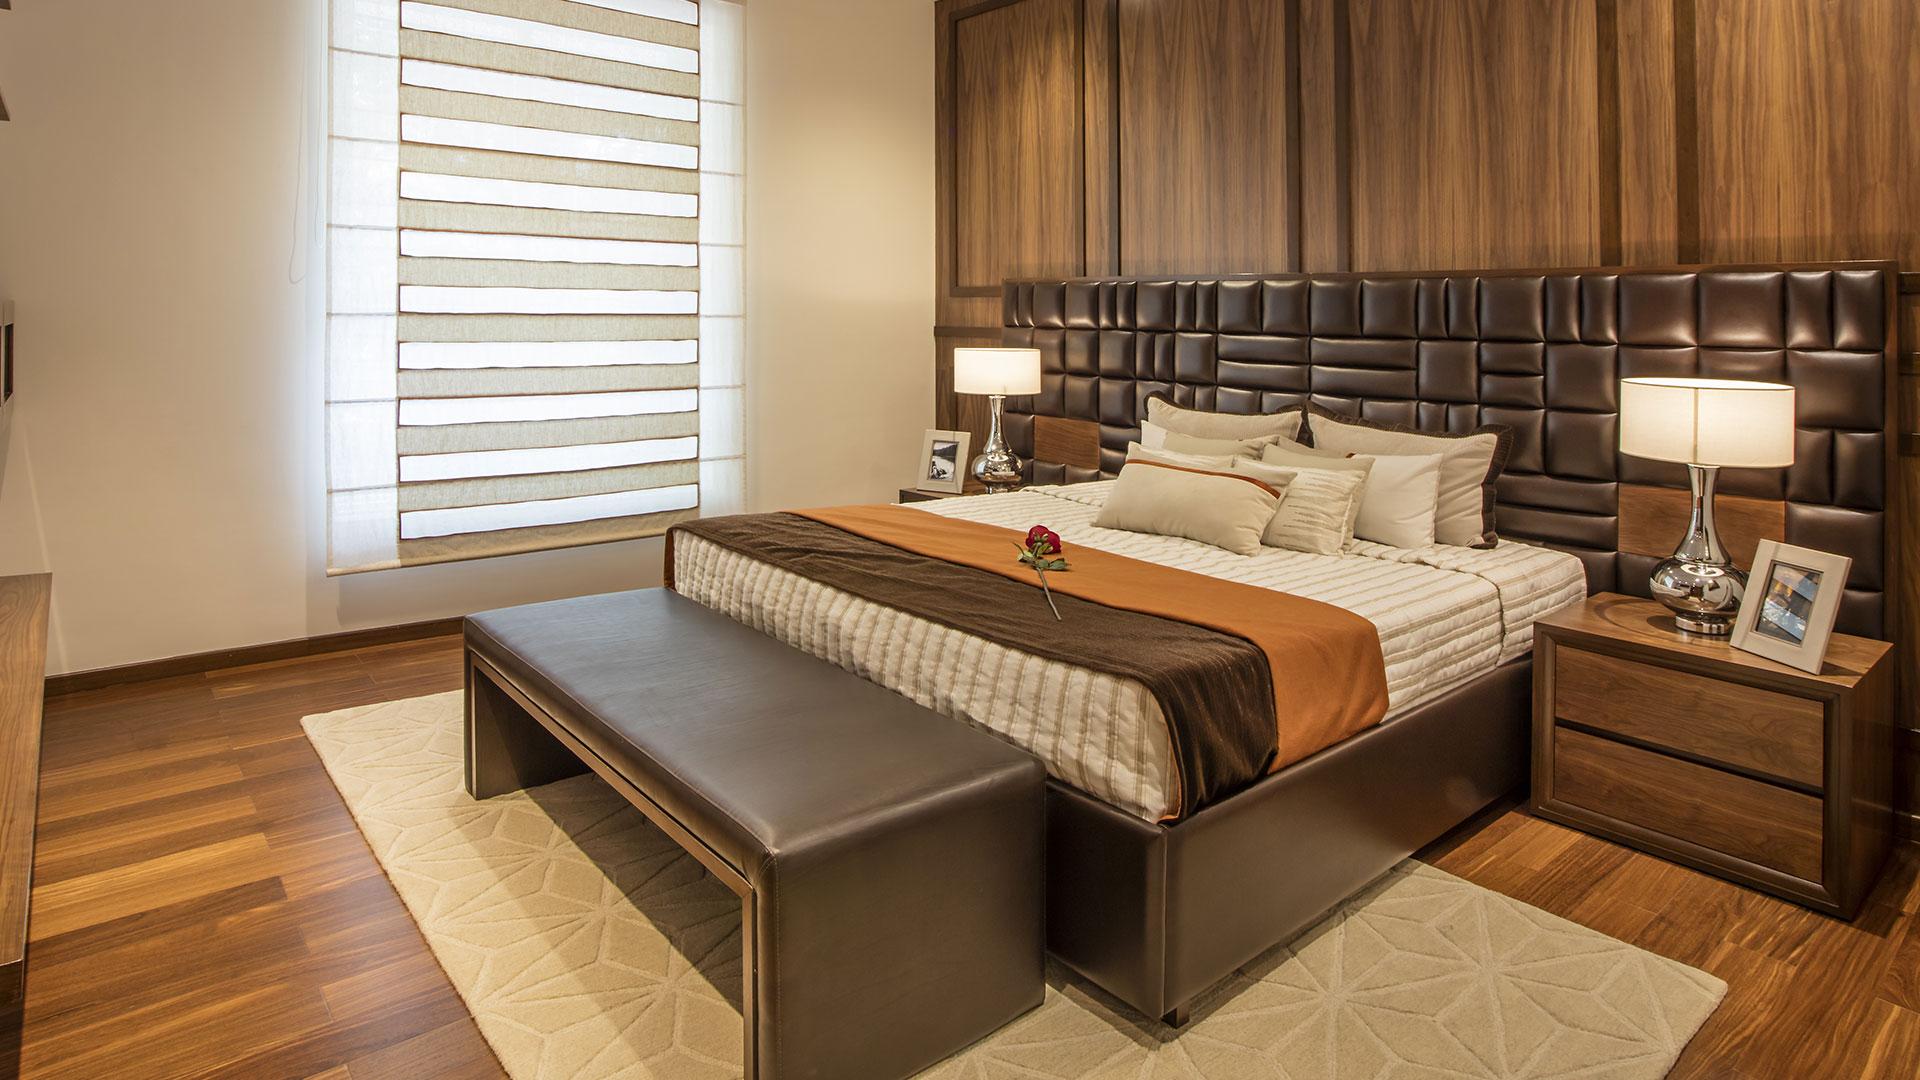 prestige-edwardian-Apartment-In-Vasanth-Nagar-Bangalore-Image-06